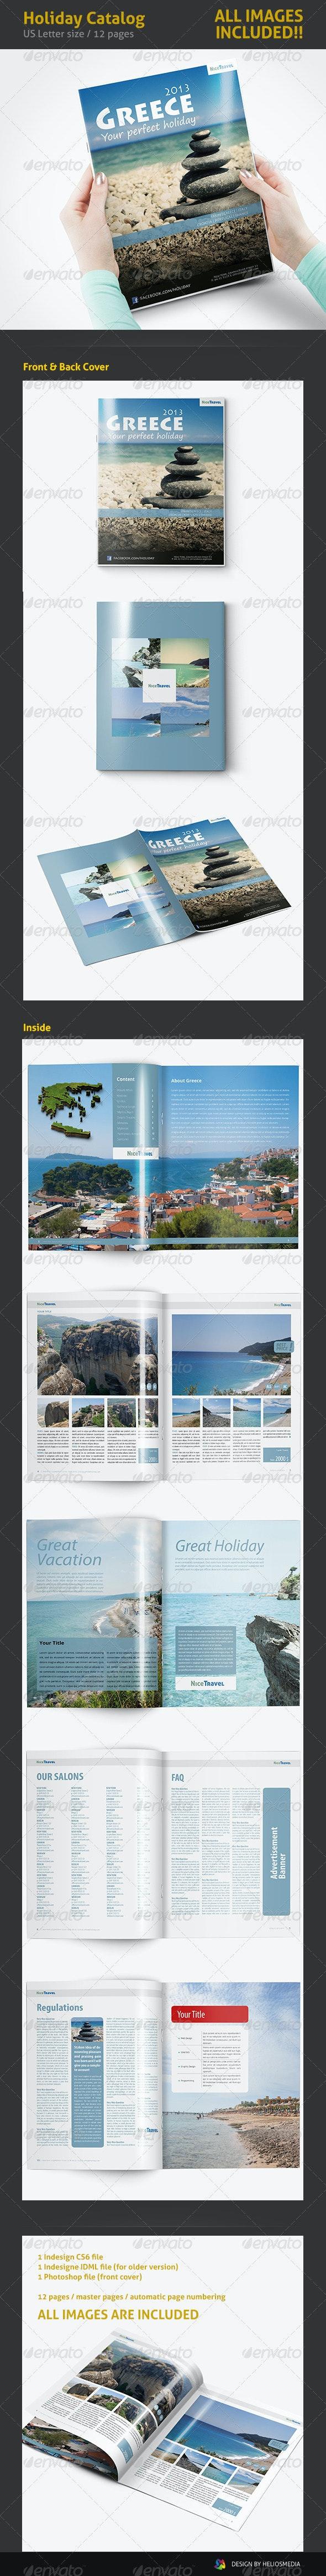 Travel Holiday Catalog - Catalogs Brochures